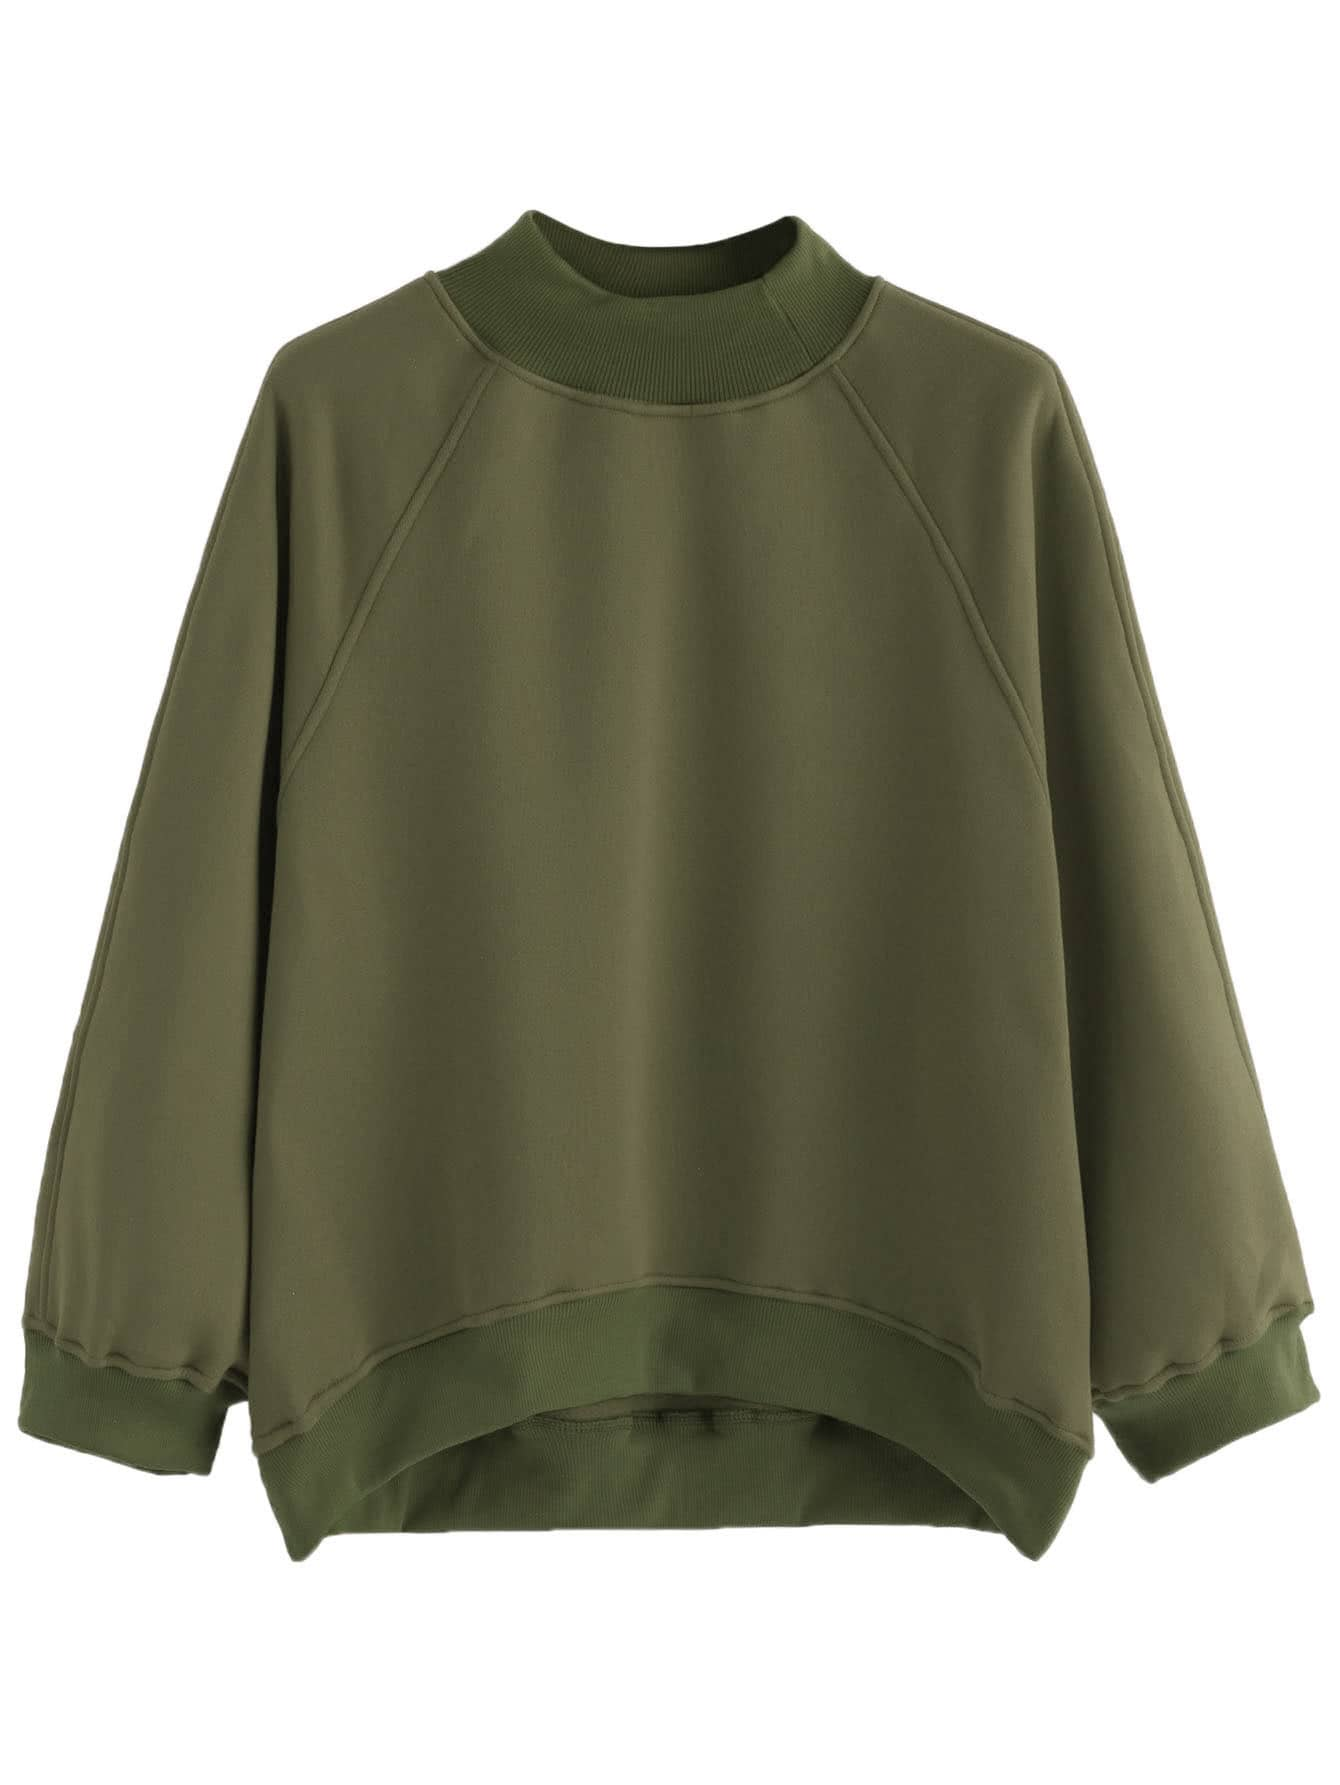 Army Green Raglan Sleeve Dip Hem Sweatshirt two tone raglan sleeve sweatshirt